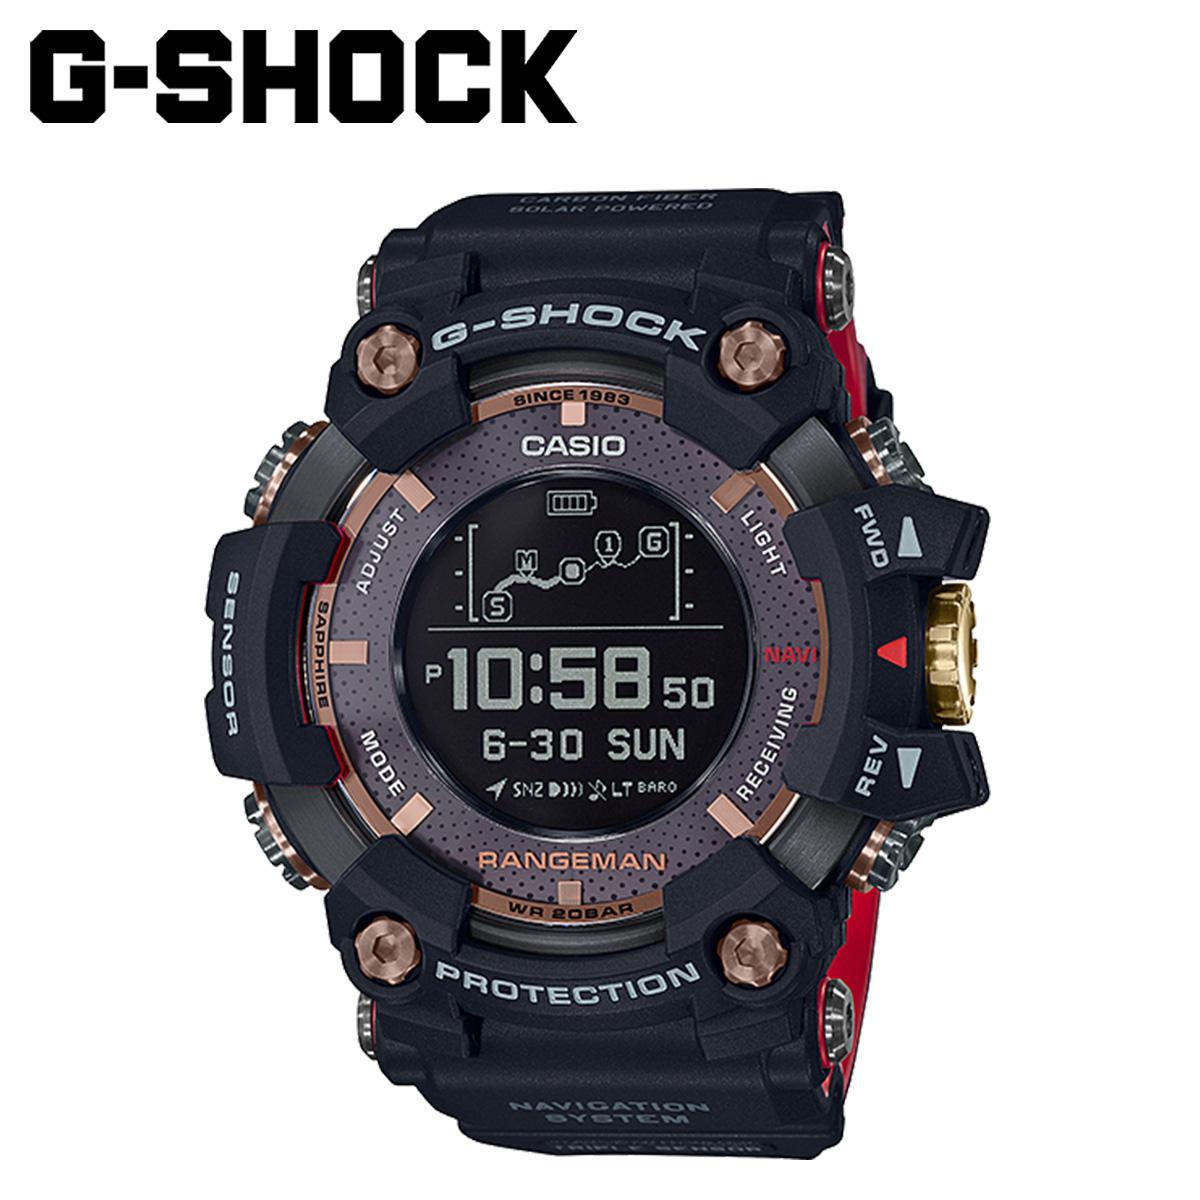 CASIO RANGEMAN MAGMA OCEAN カシオ G-SHOCK 腕時計 GPR-B1000TF-1JR 35周年 ブラック メンズ レディース